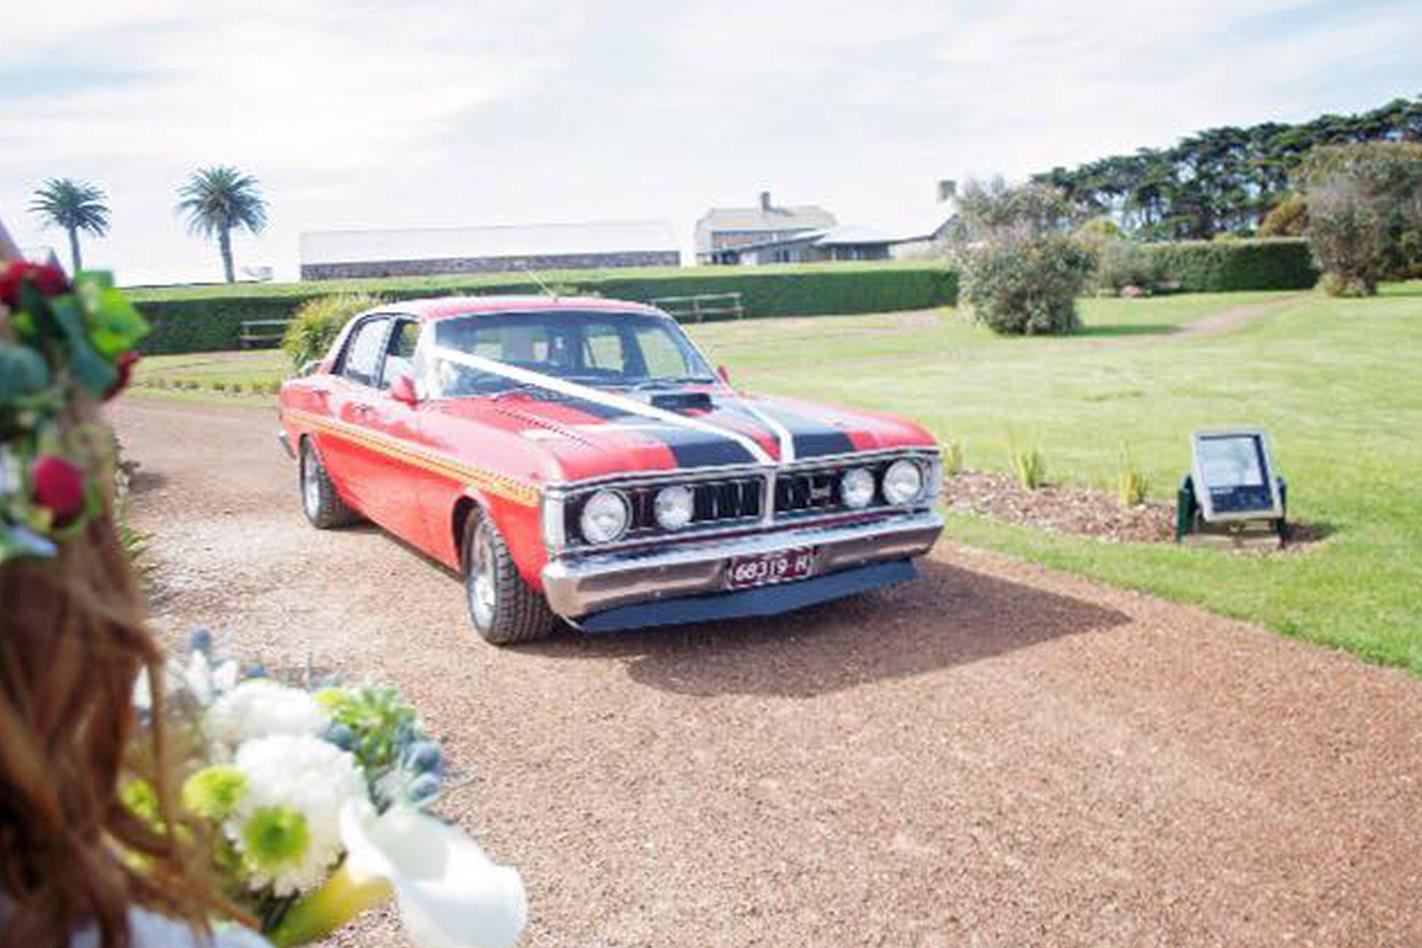 Justin Medwin's Falcon wedding car